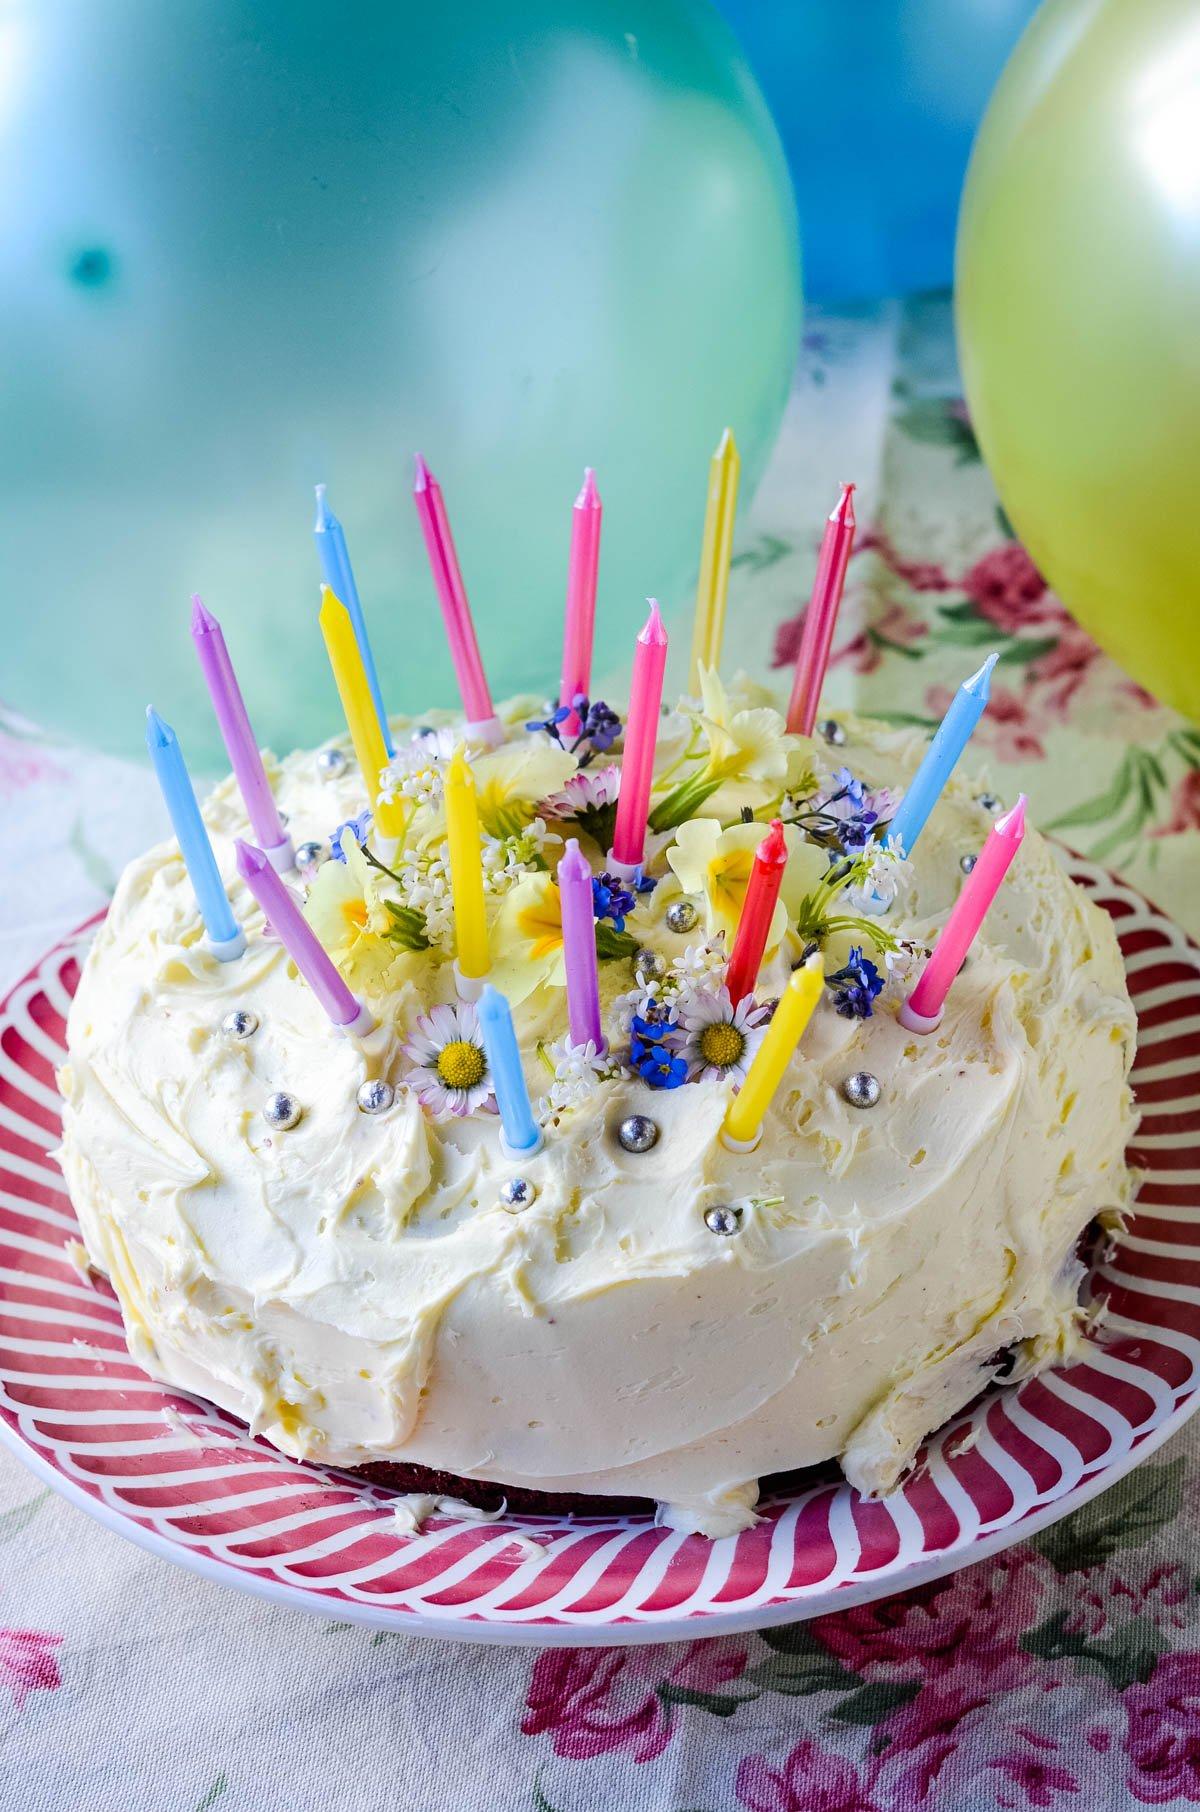 red velvet birthday cake with candles